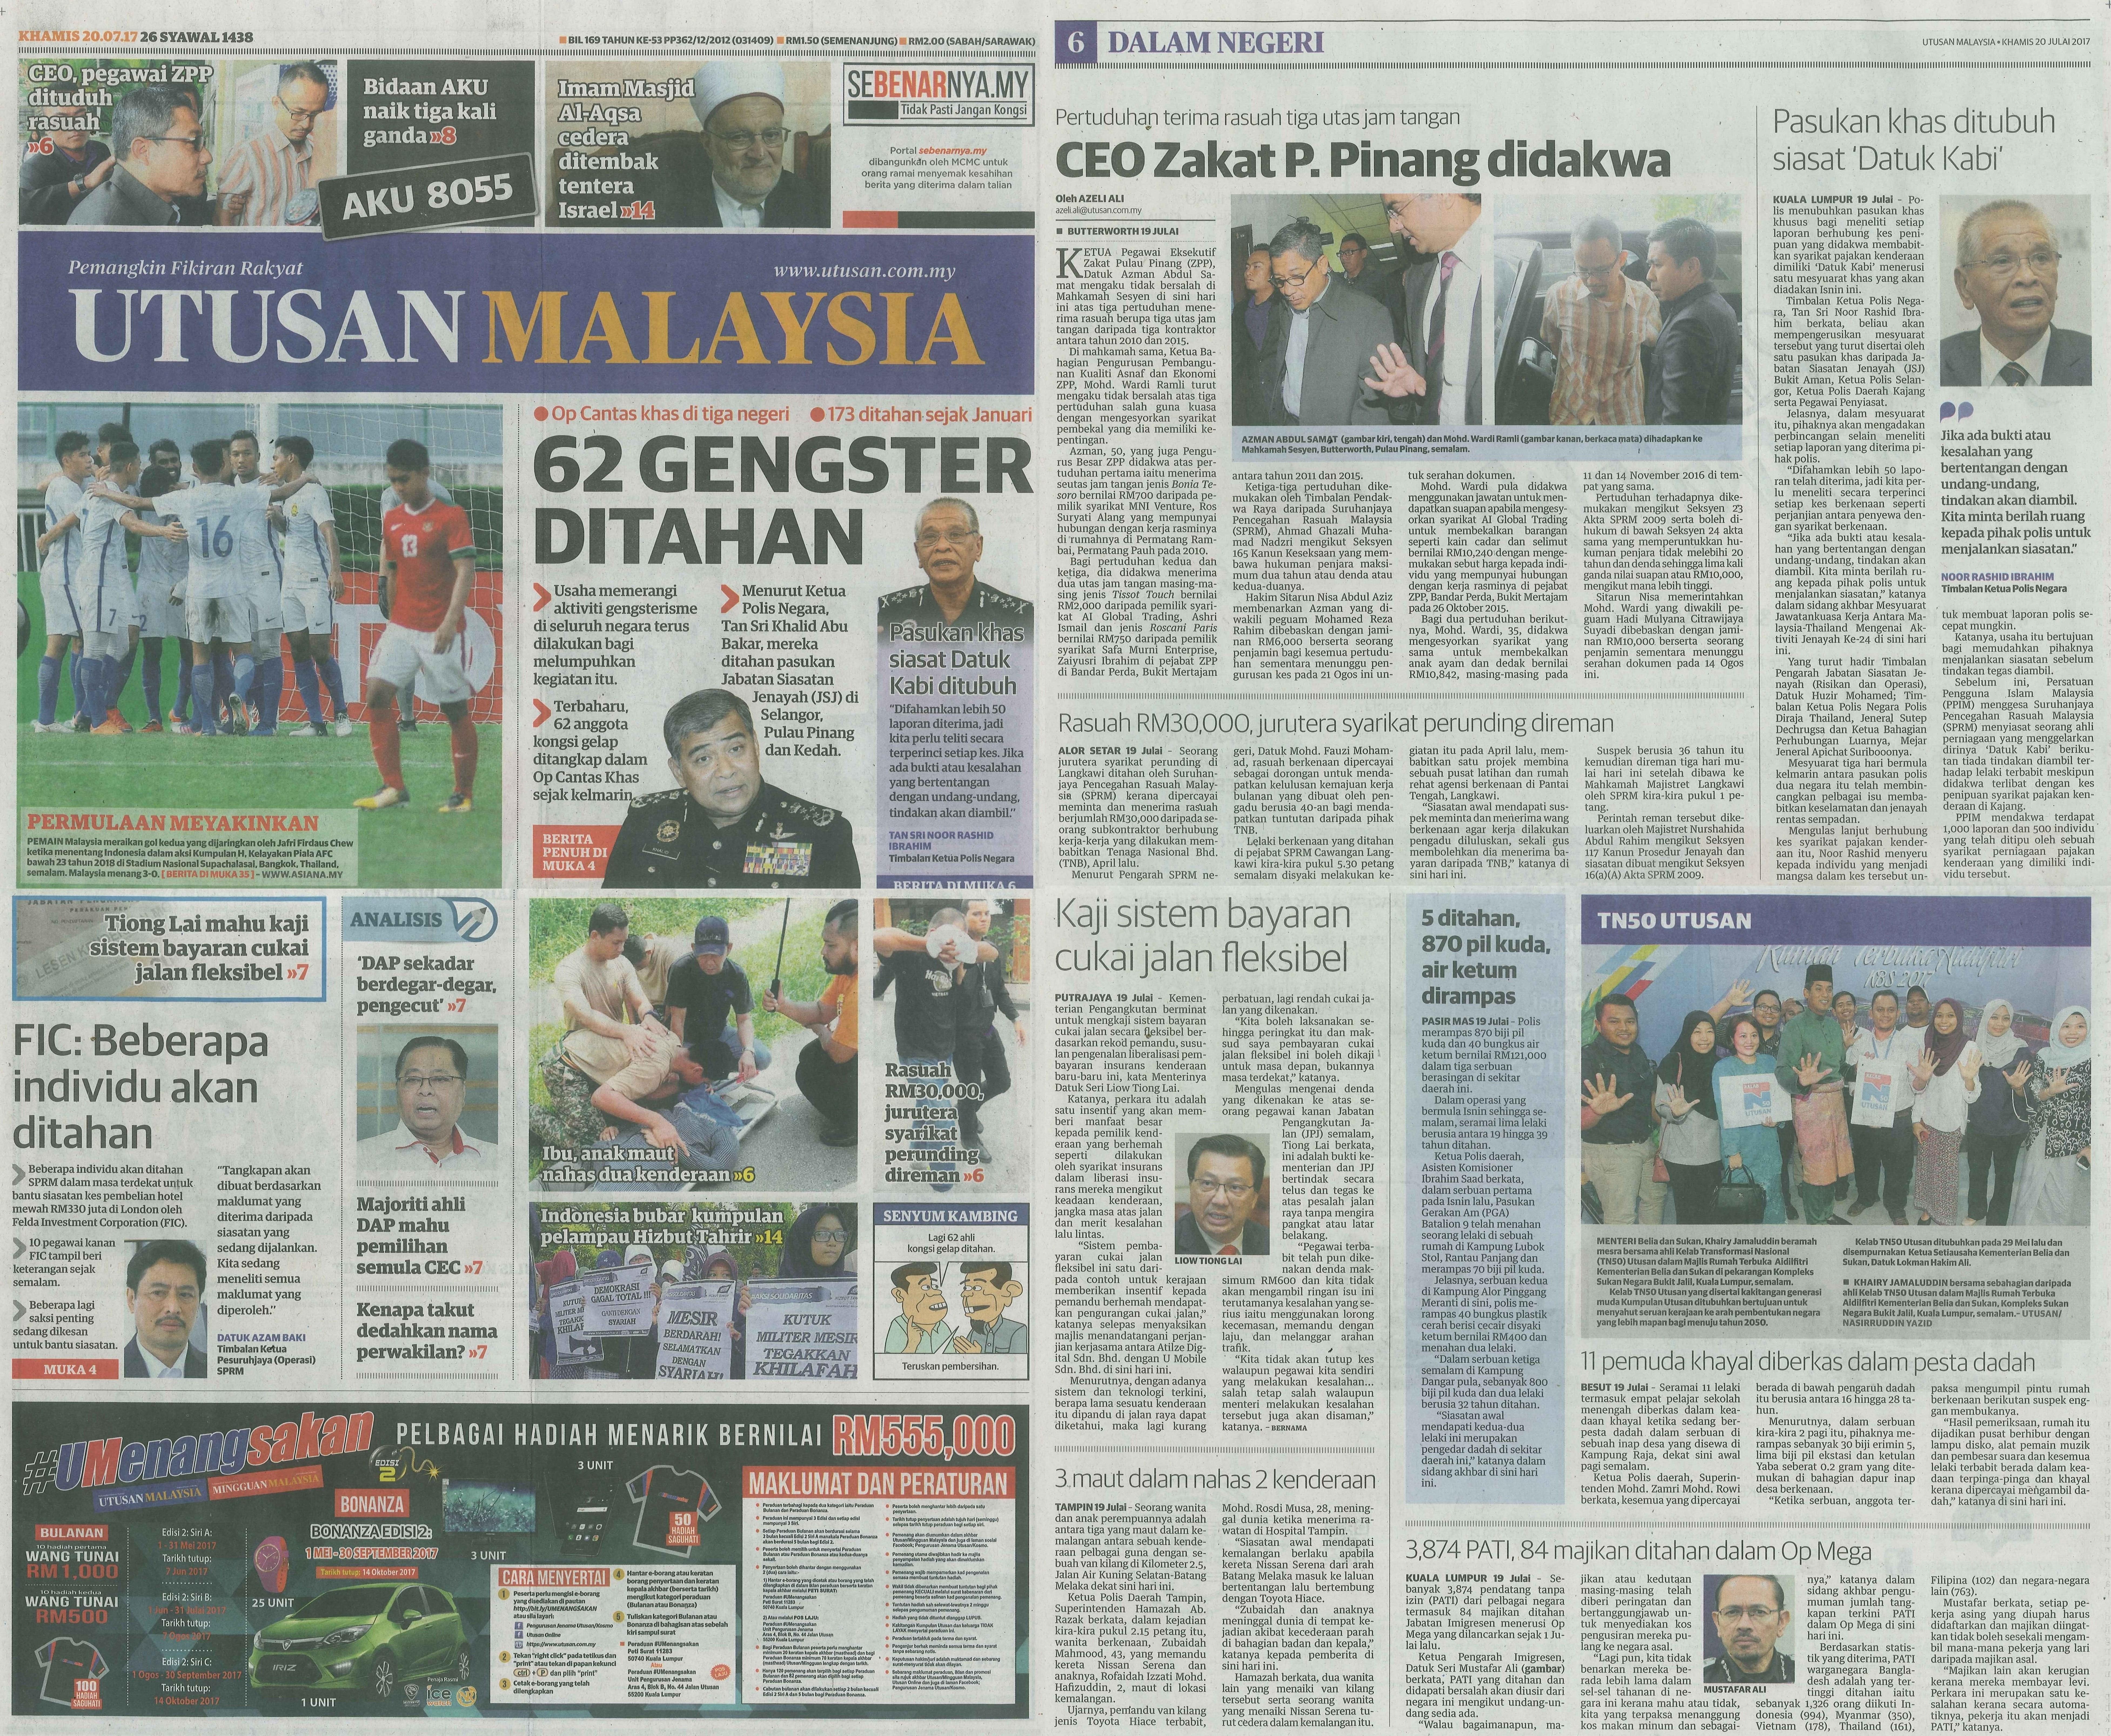 UTUSAN MALAYSIA 20.7.2017